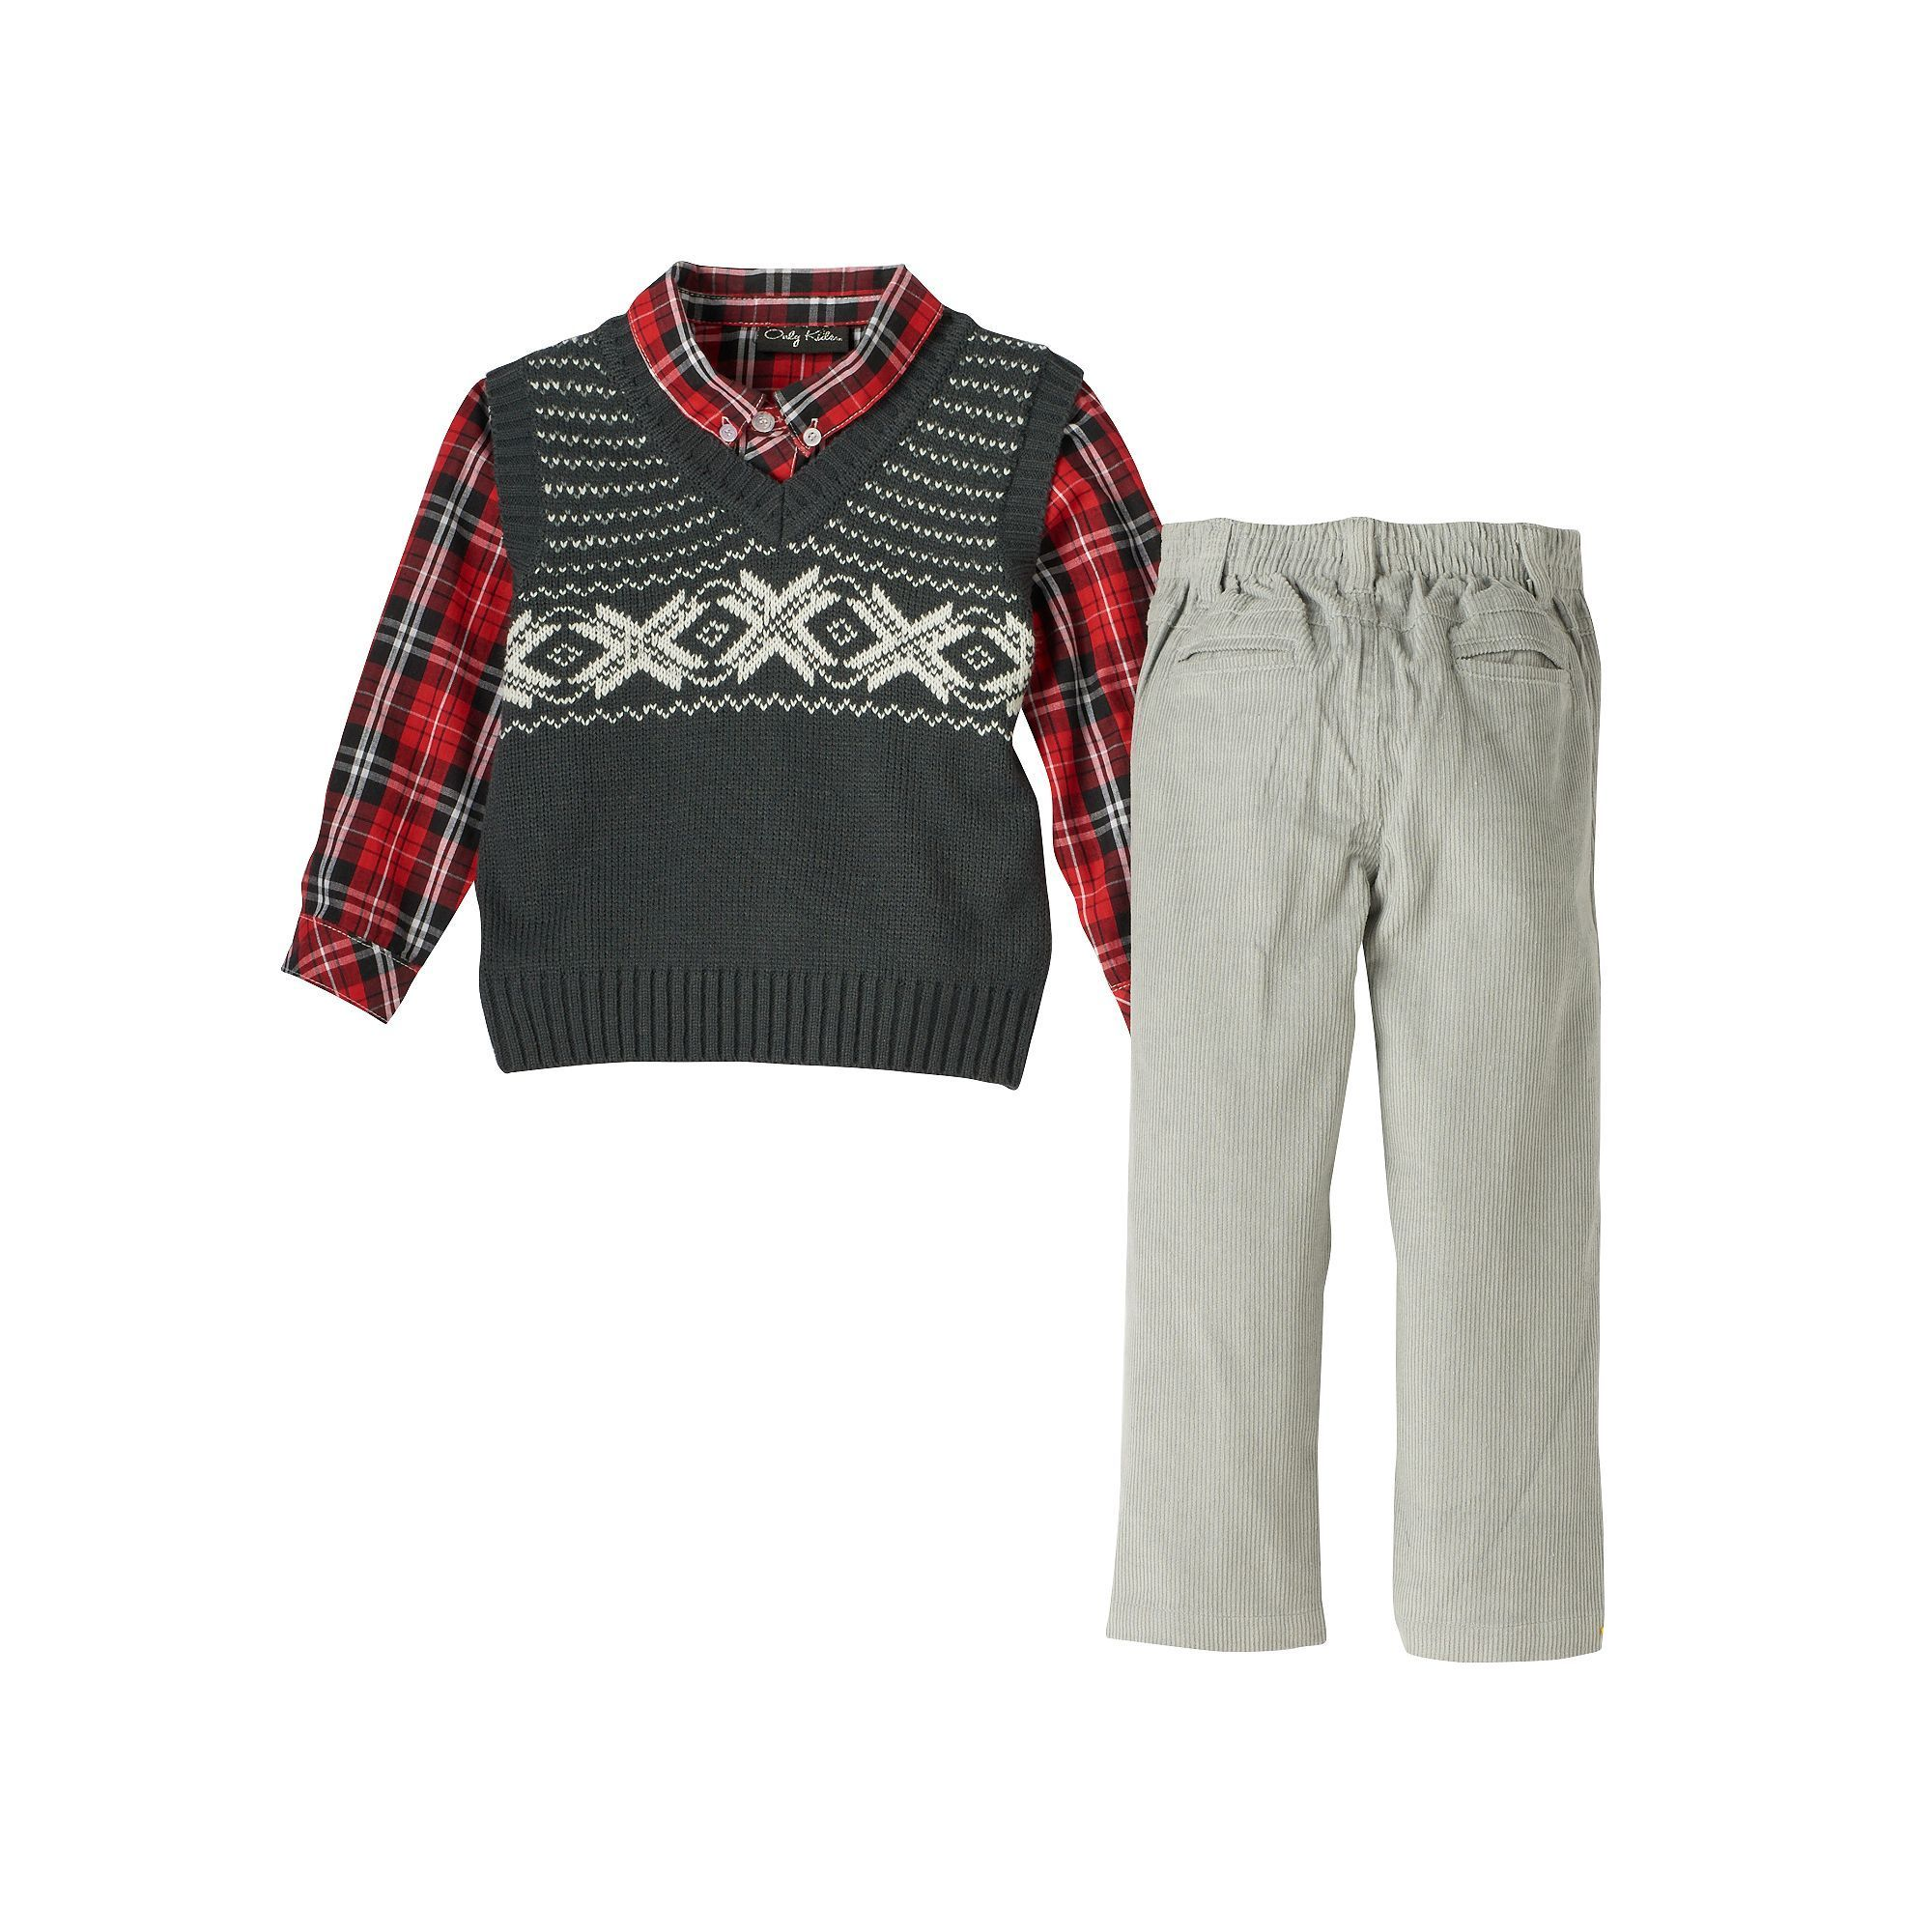 Baby Boy ly Kids Apparel Argyle Sweater Vest Plaid Shirt